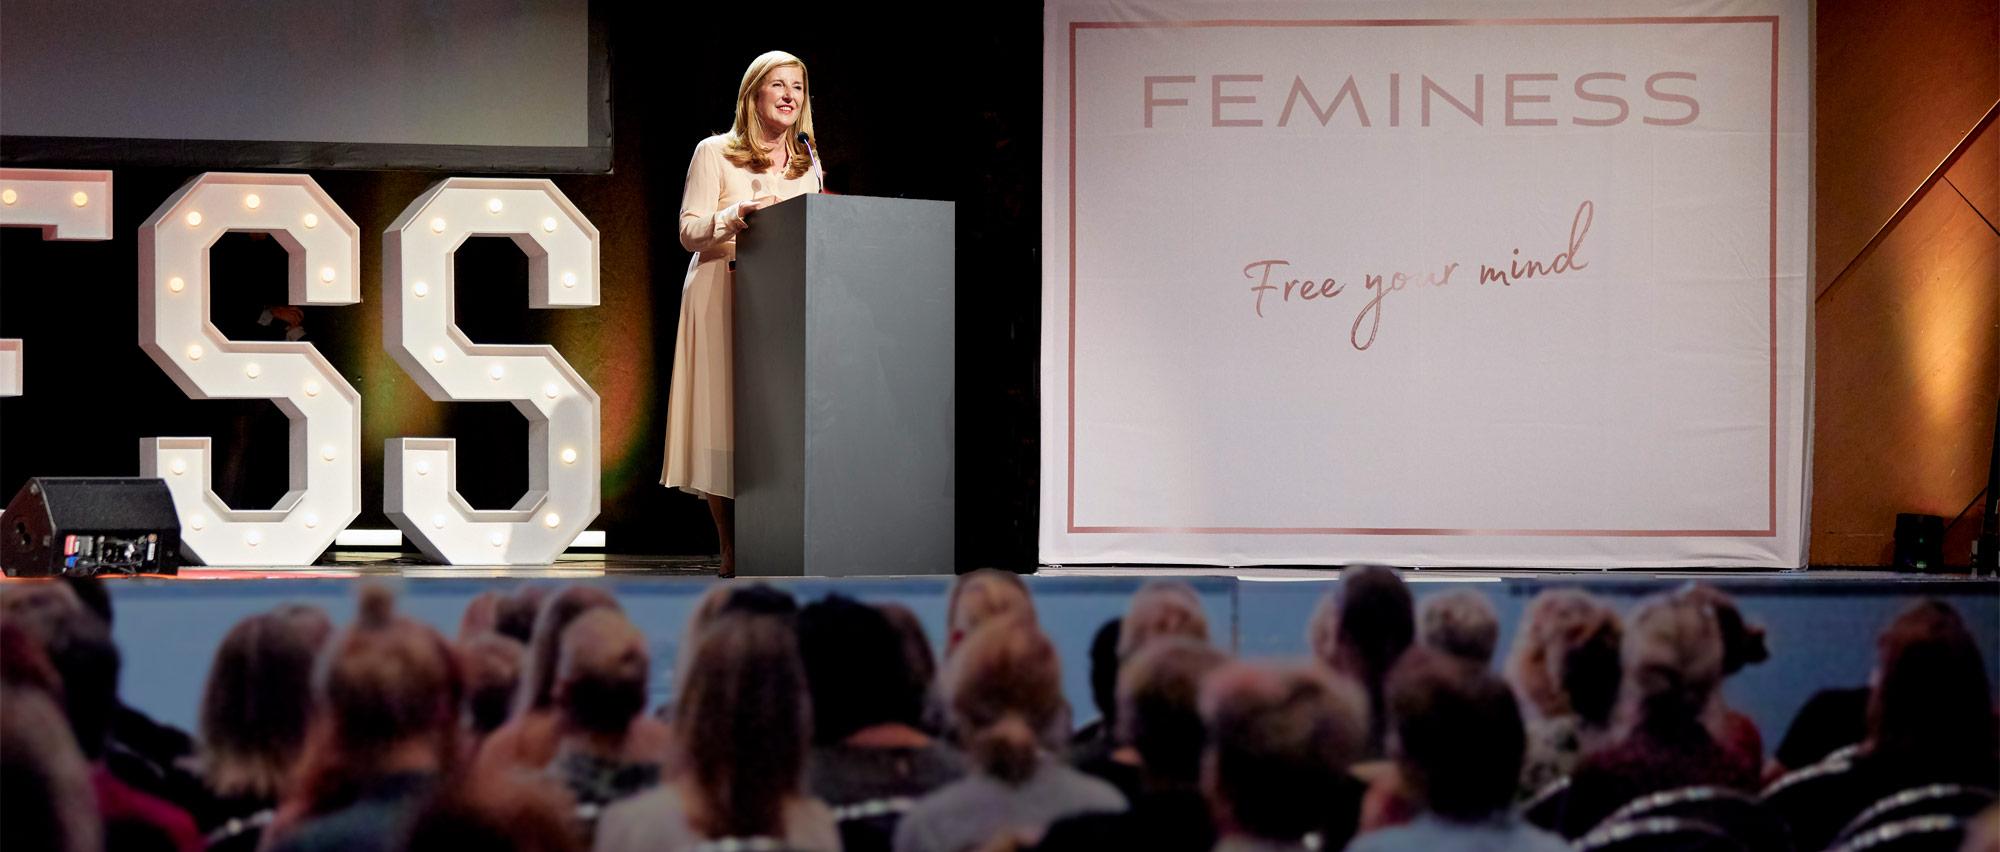 Nelly Kostadinova spricht vor fünfhundert Zuhörern